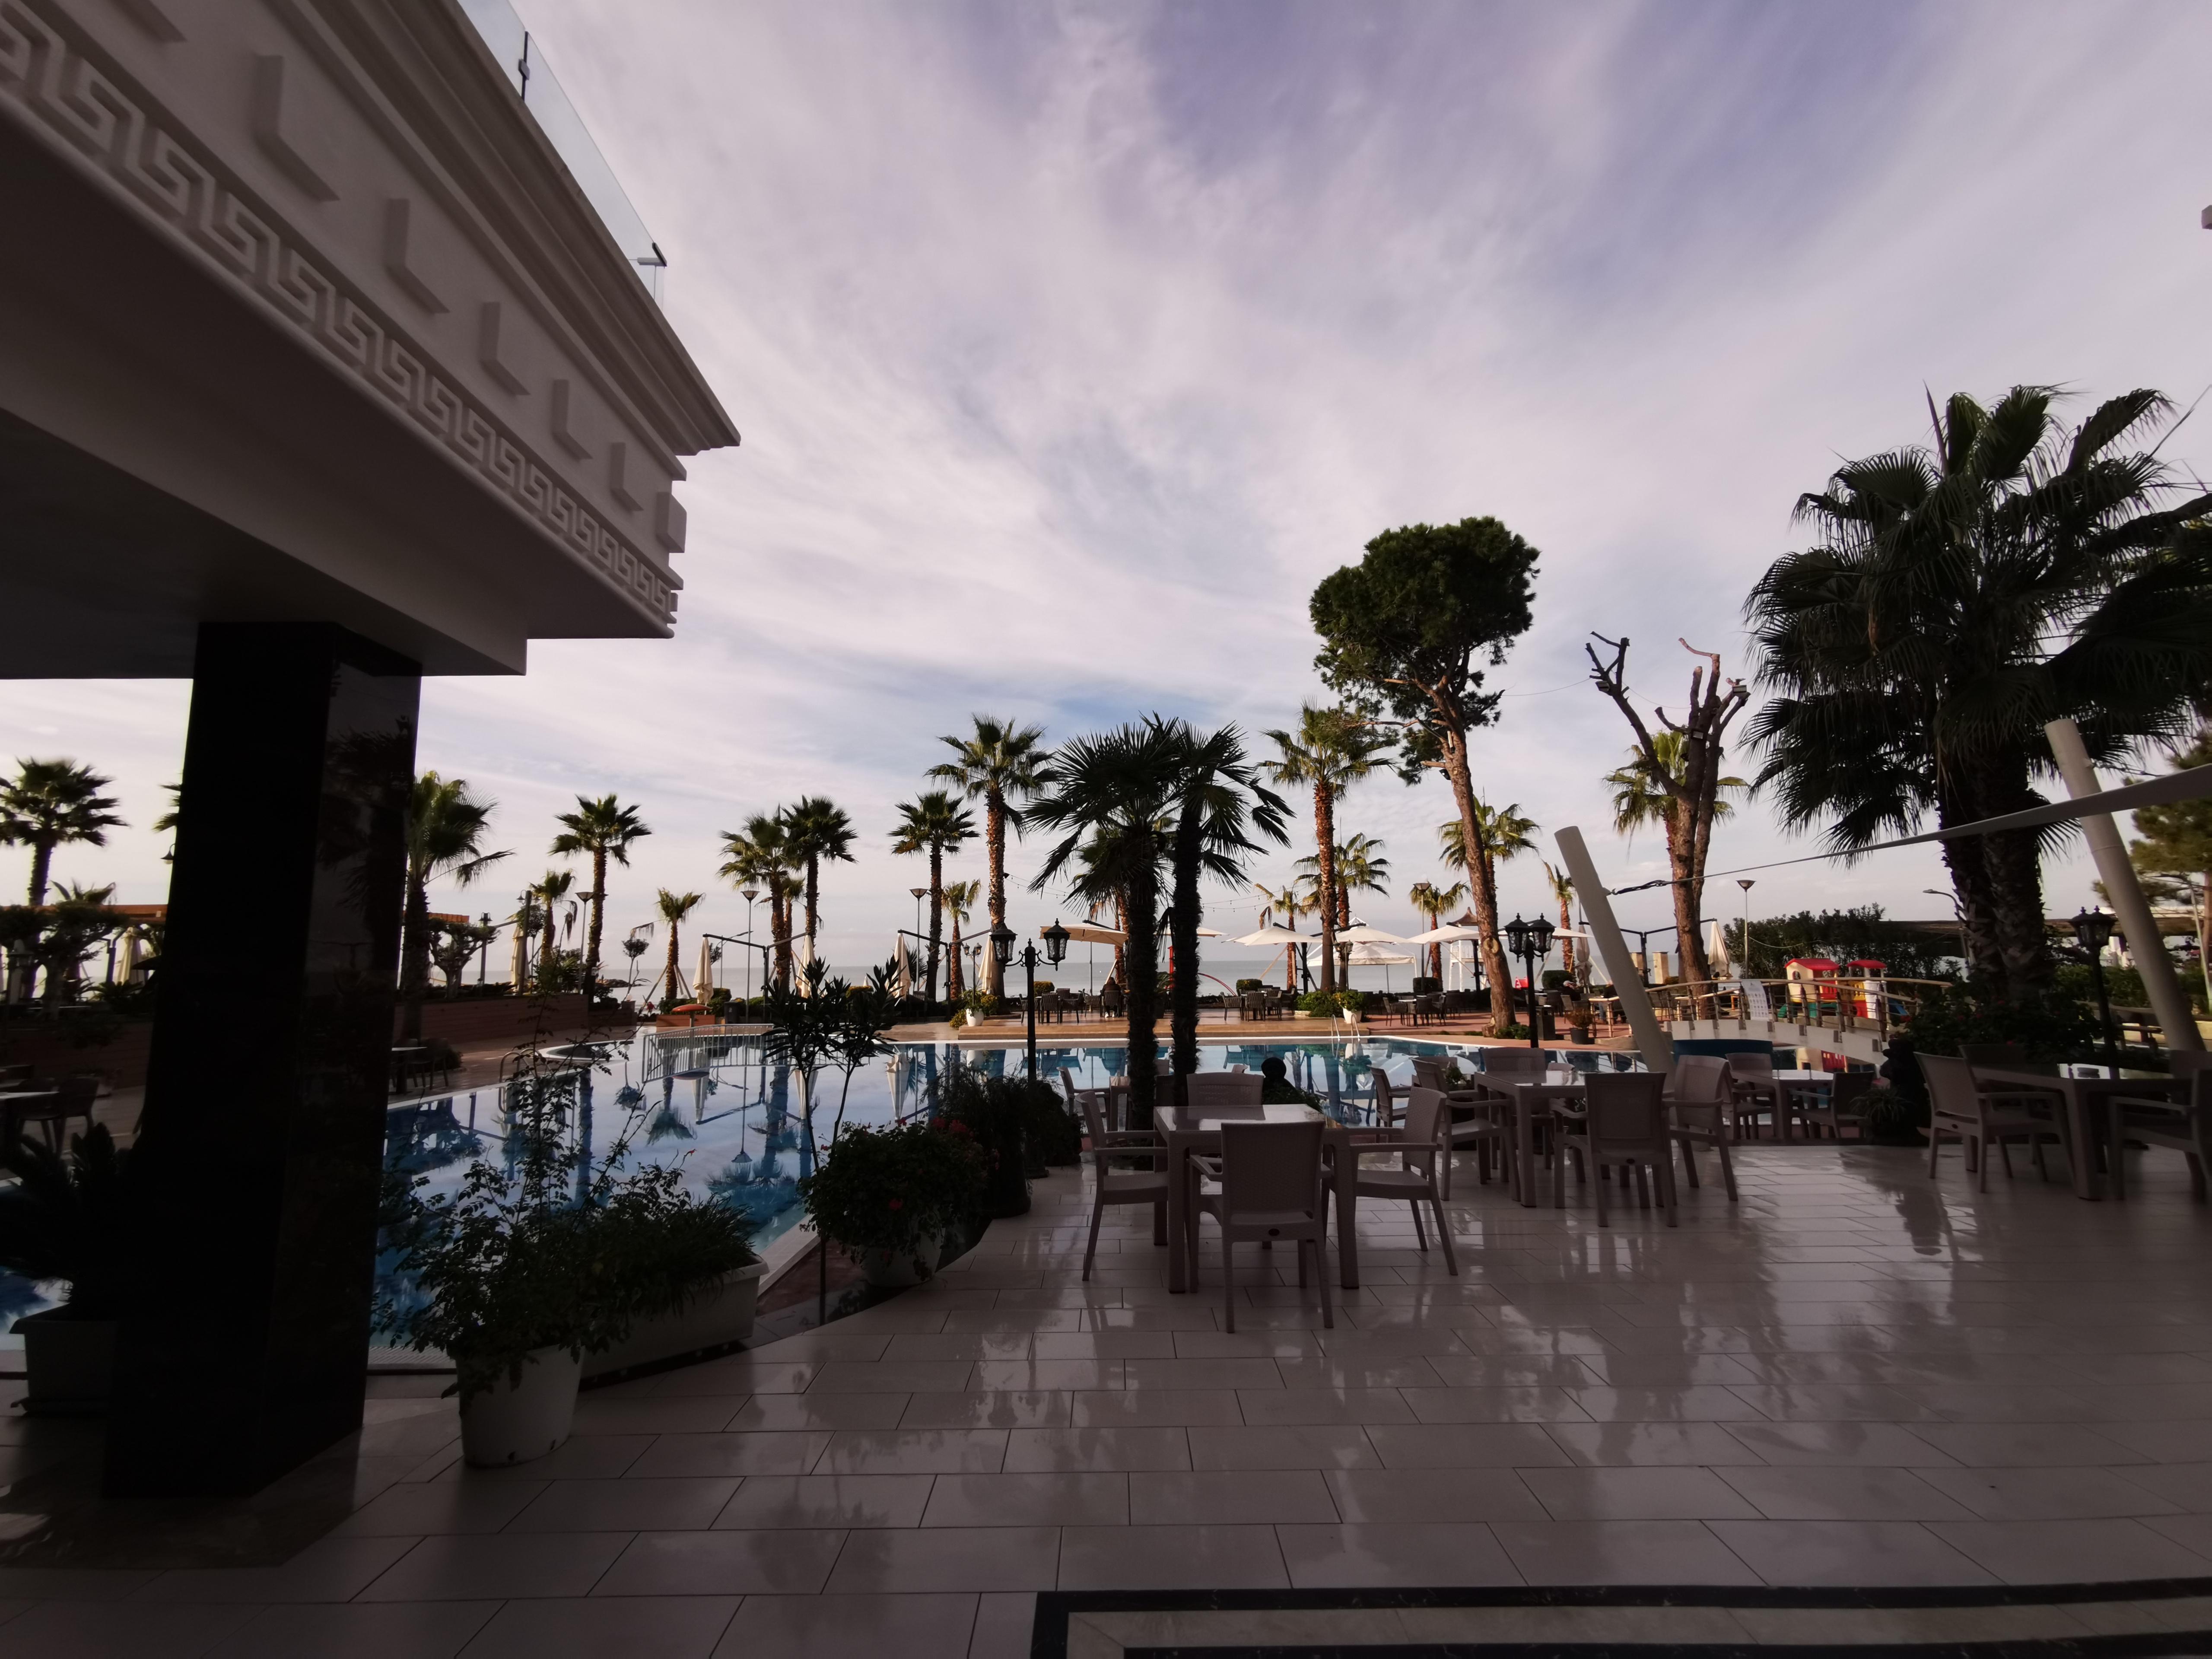 Letovanje Albanija autobusom, Drač, Hotel Fafa Premium,bazen  uveče